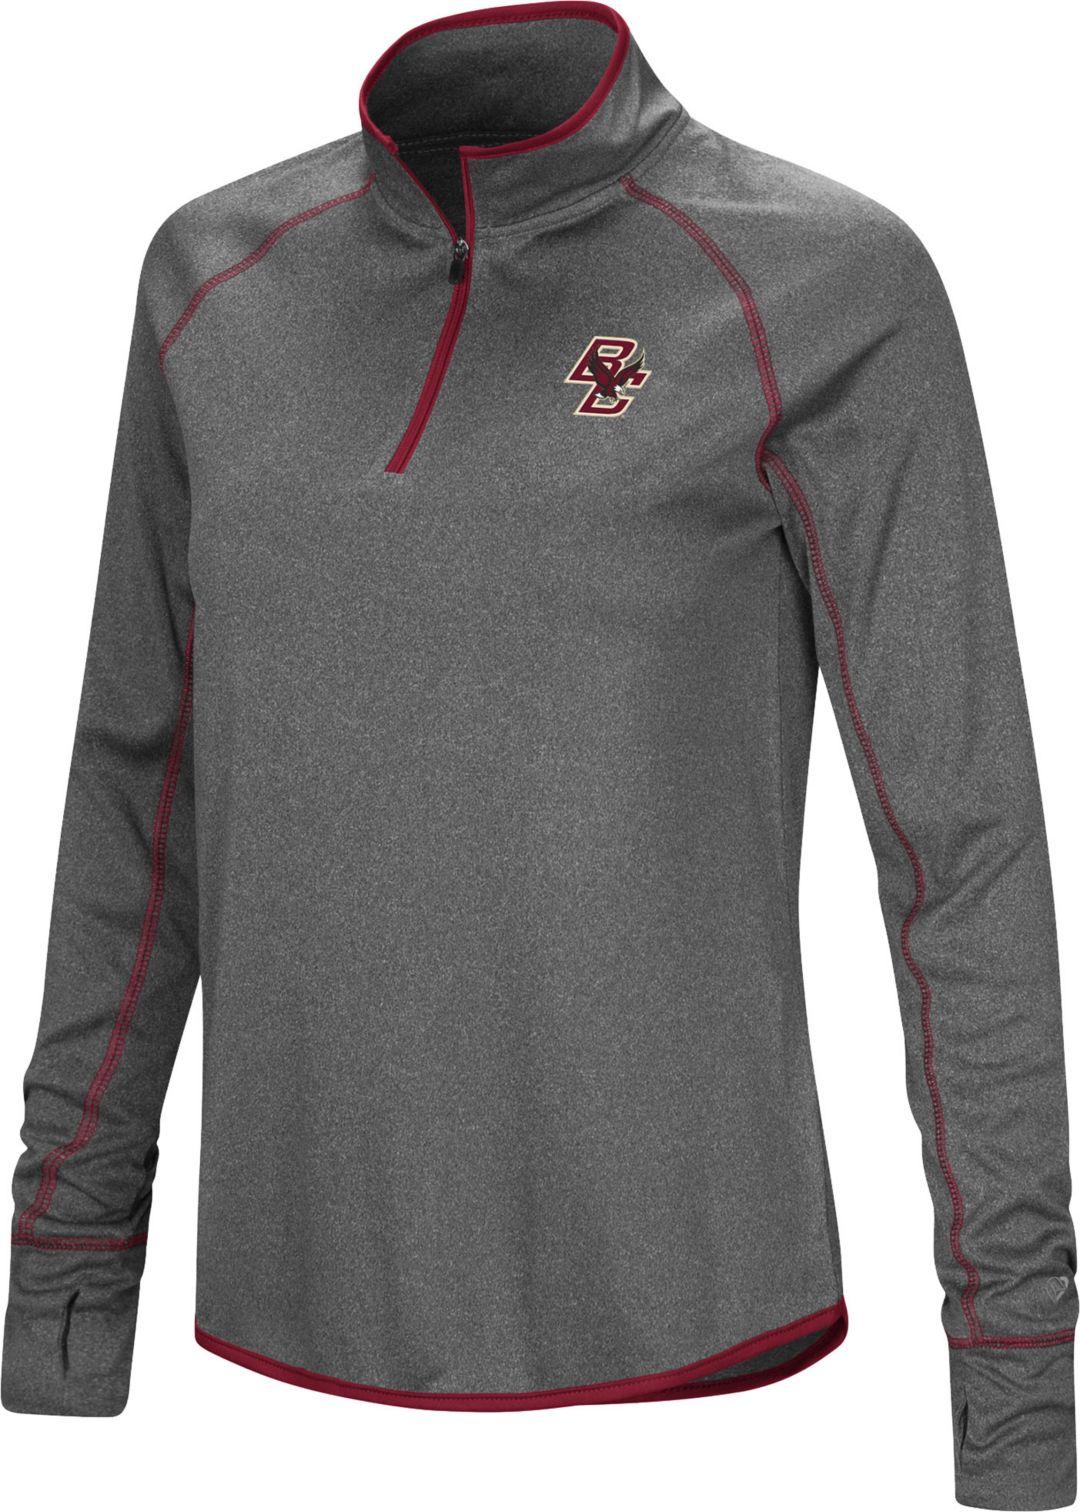 newest 2c390 4e0f5 Colosseum Women's Boston College Eagles Grey Stingray Quarter-Zip Shirt